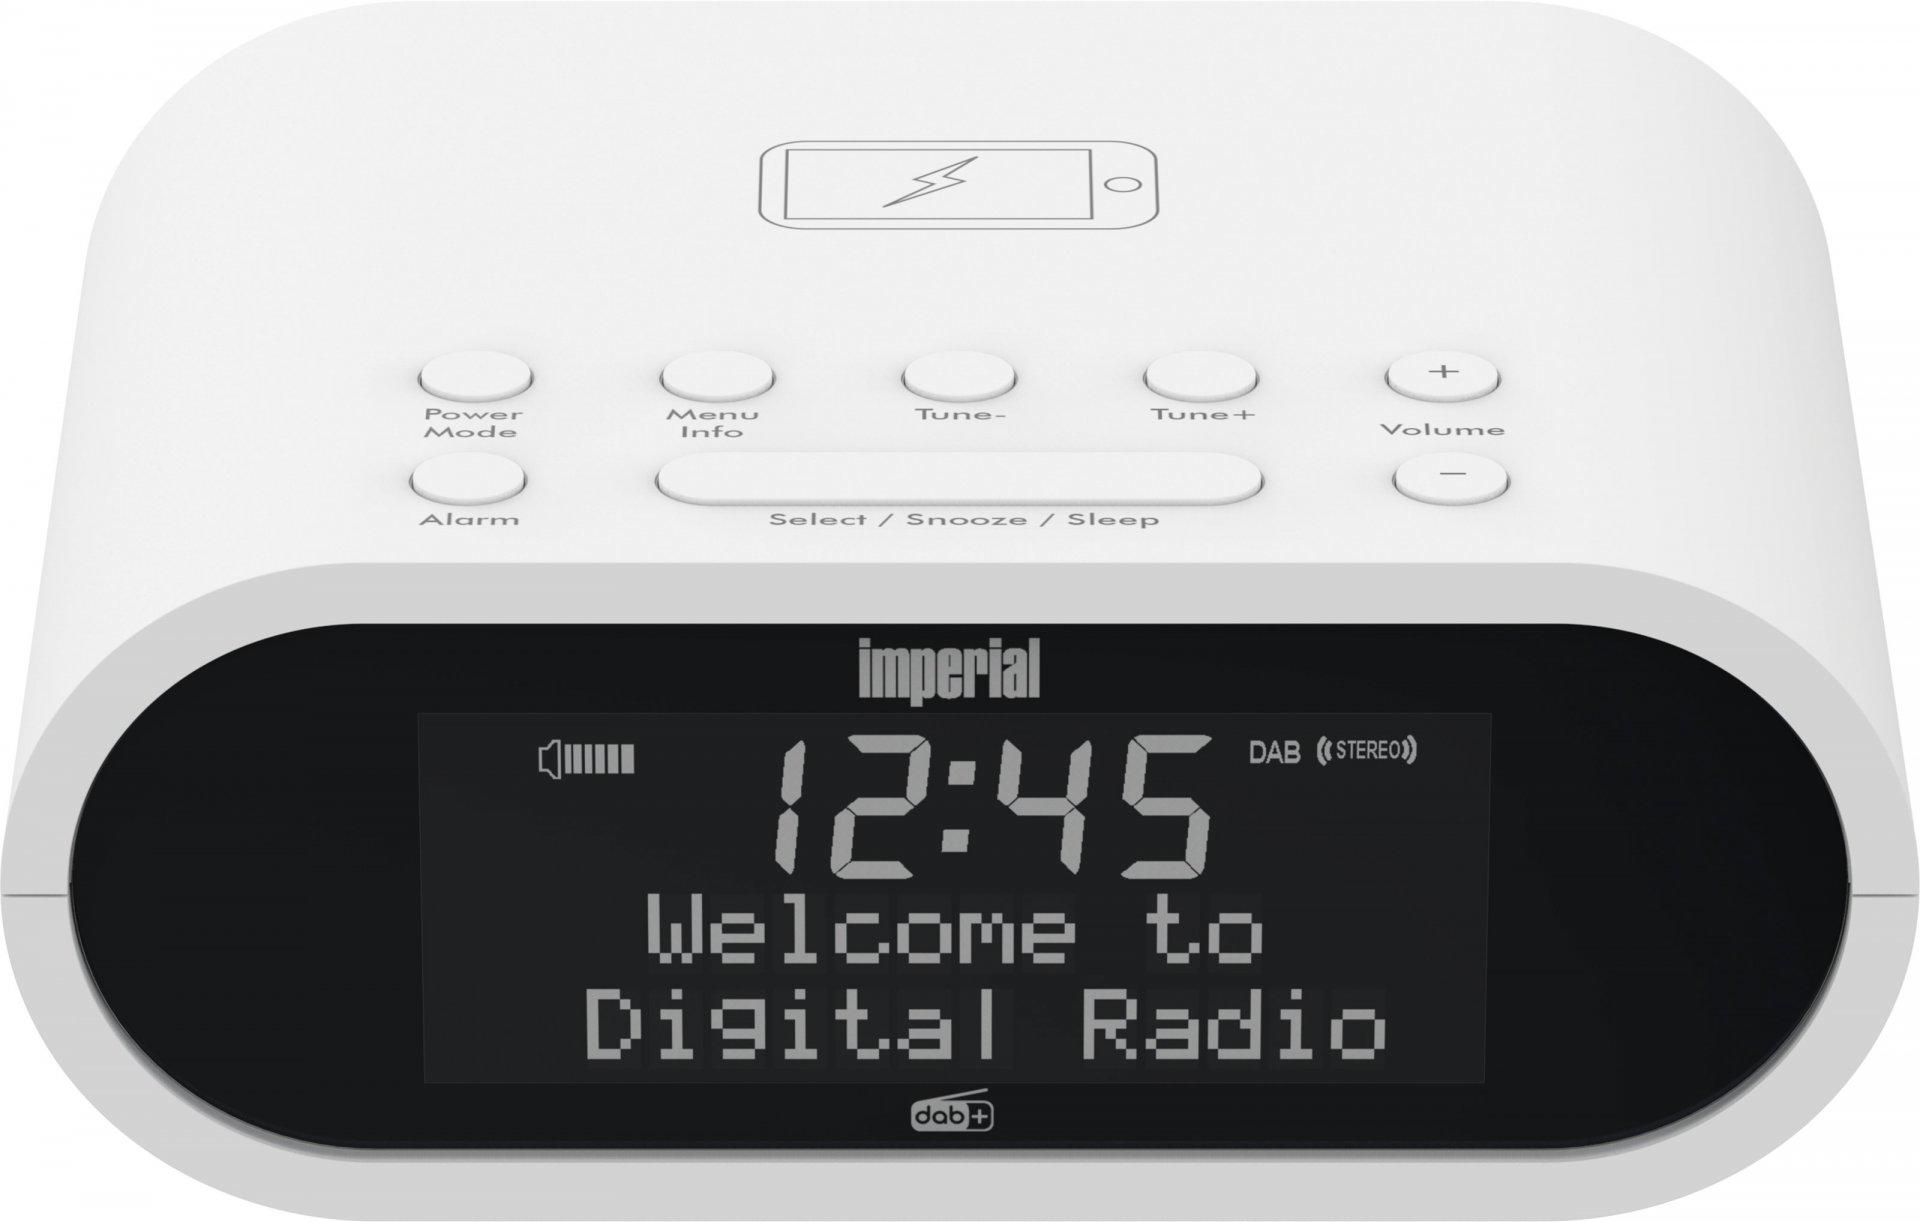 Telestar Dabman D20 - Uhr - Digital - DAB - DAB+ - FM - UHF - 87.5 - 108 MHz - 174 - 240 MHz - 1 W